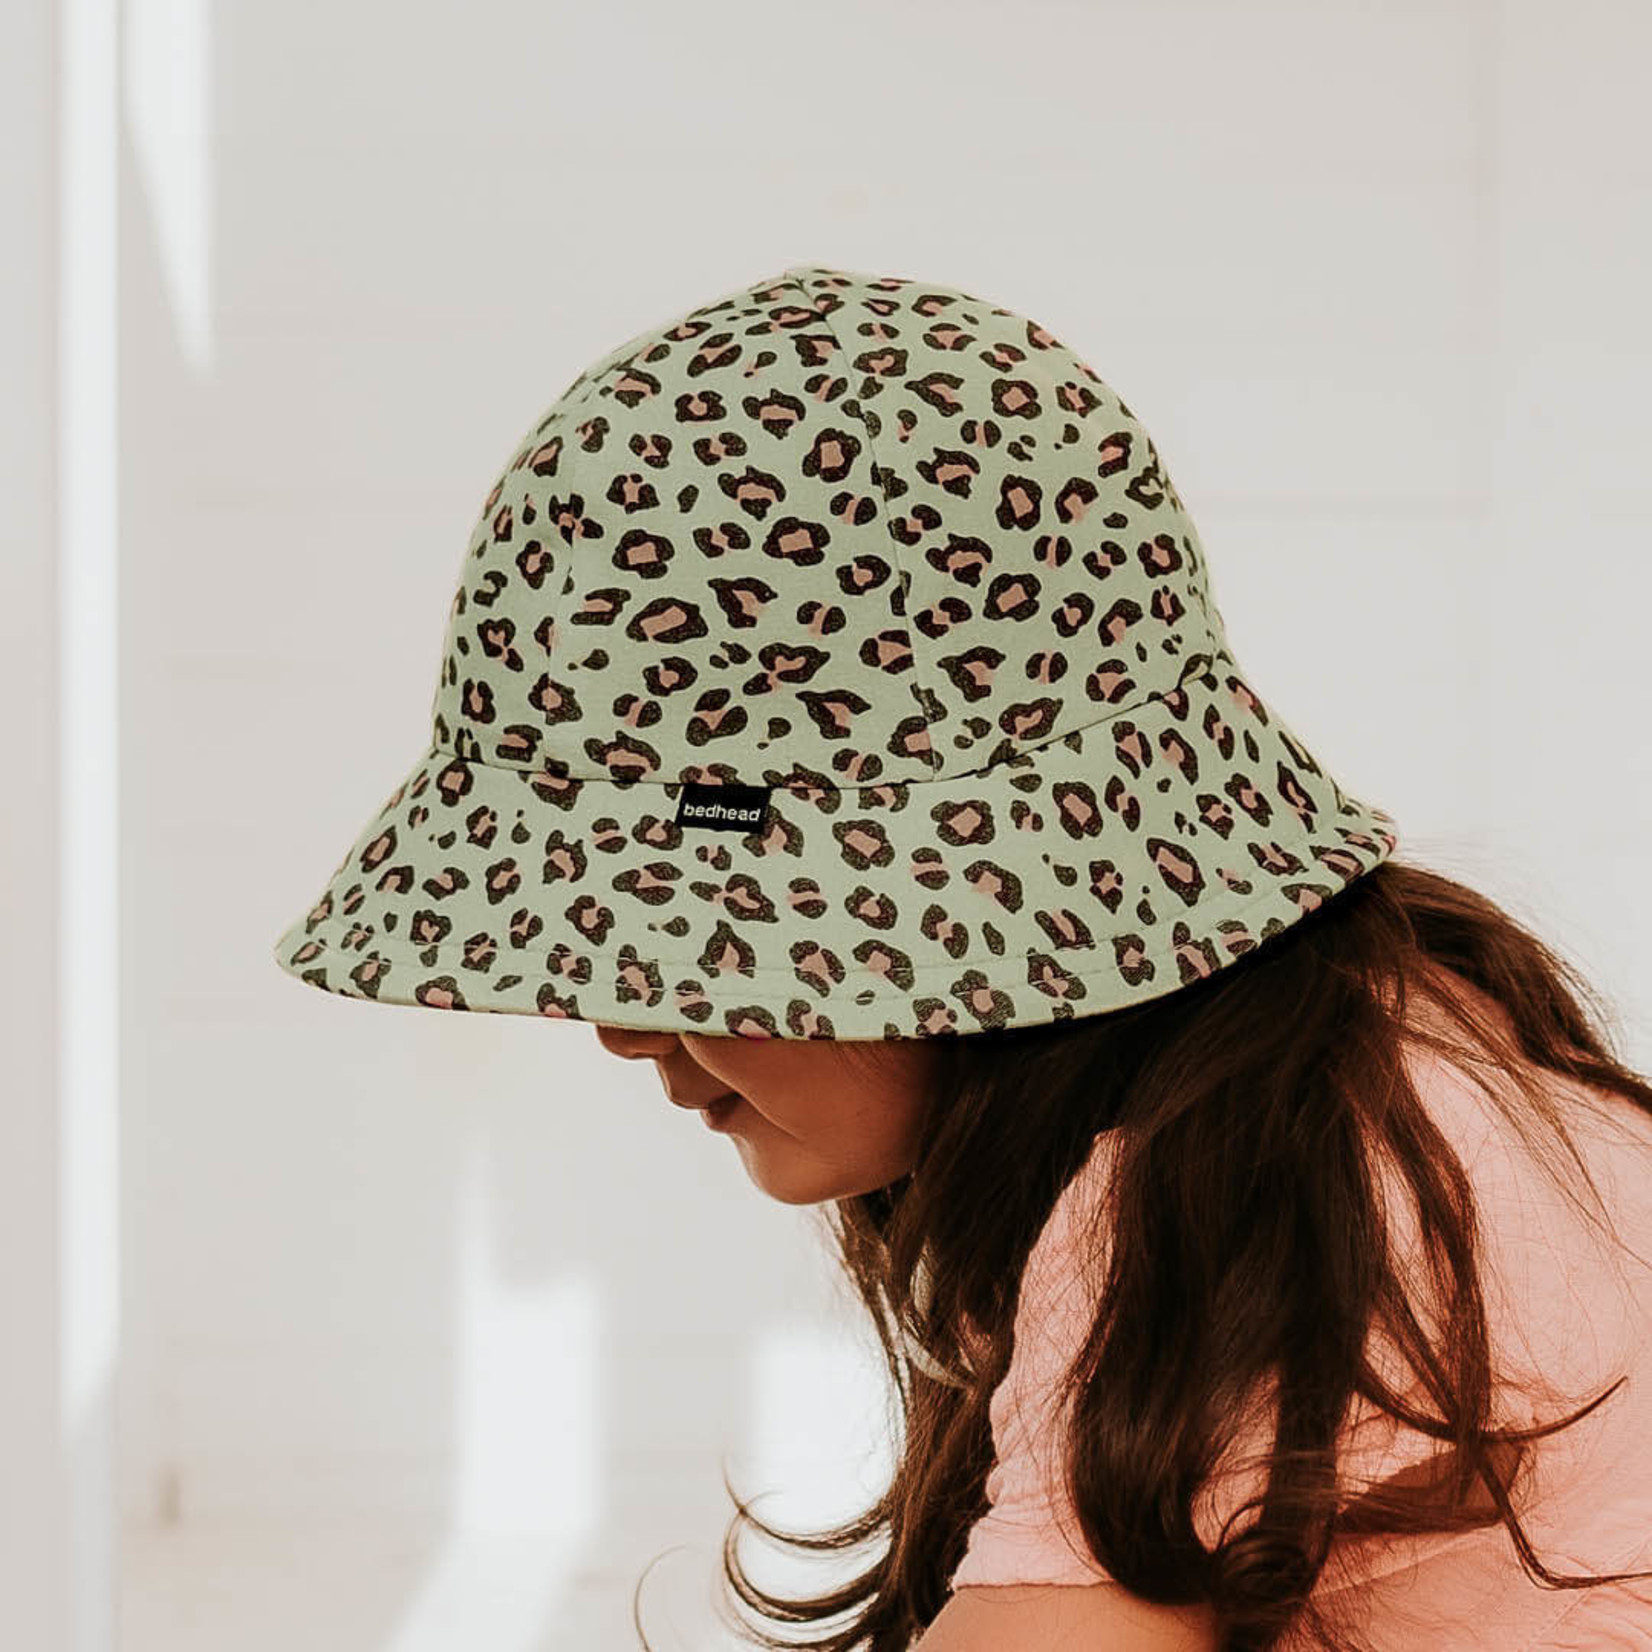 Bedhead Hats Copy of Bedhead Toddler Bucket Hat - Leopard